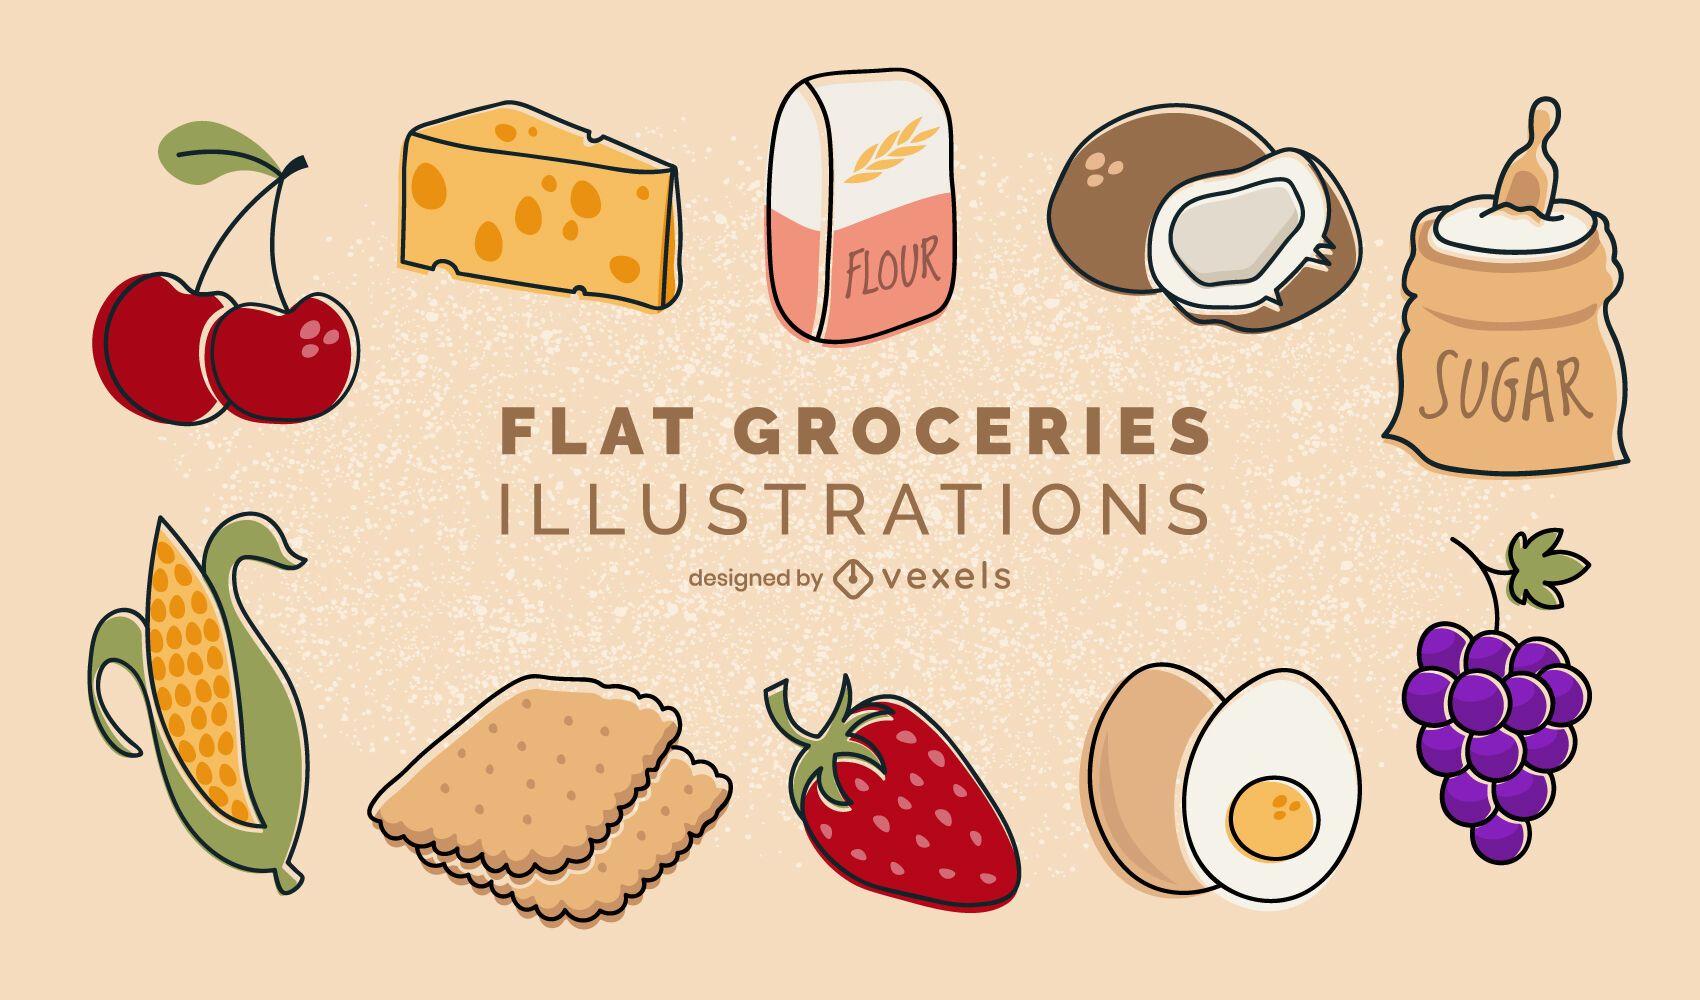 Flat groceries illustrations set